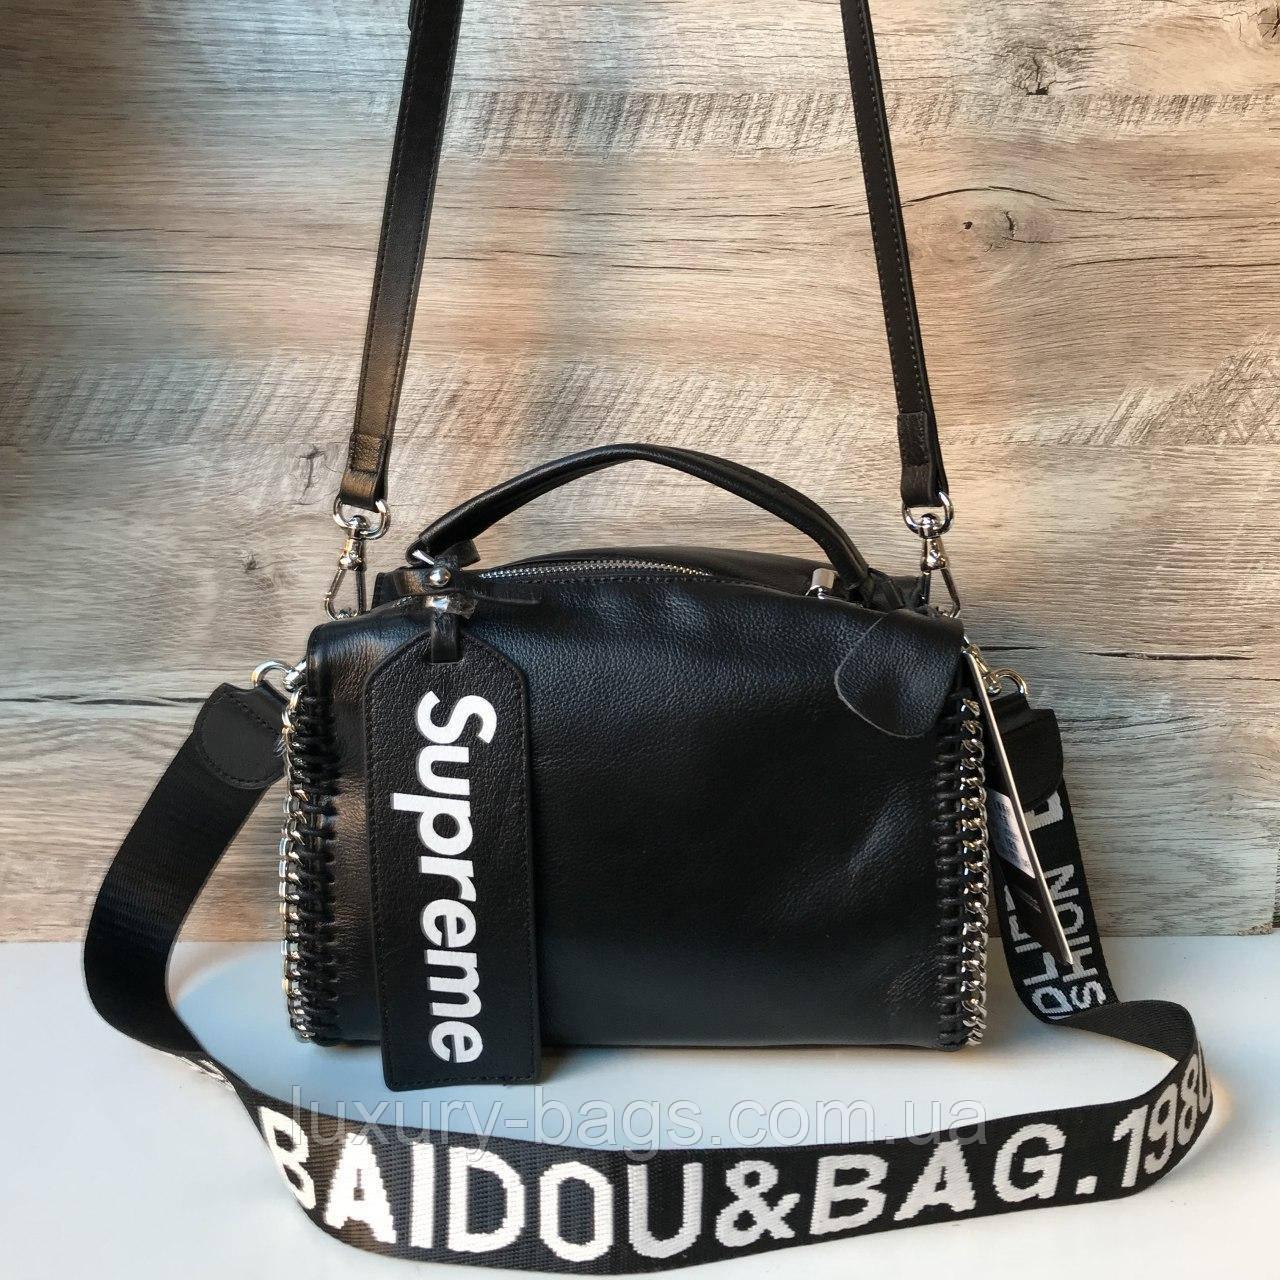 Жіноча крута шкіряна сумка Supreme